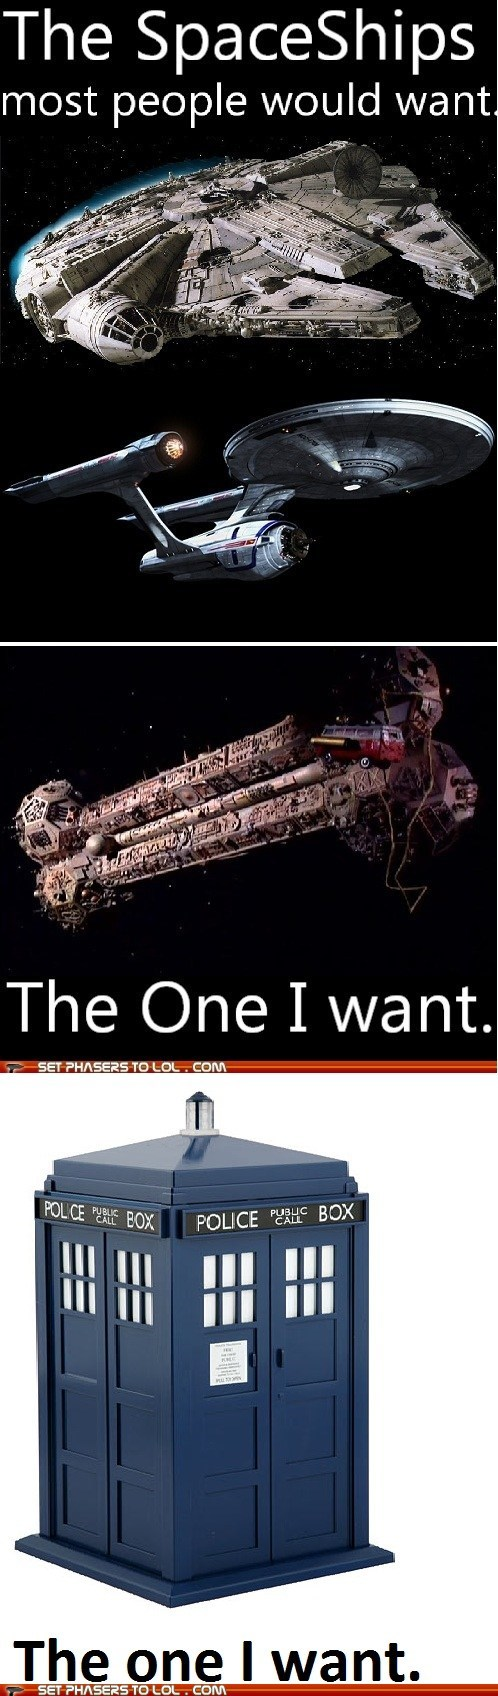 doctor who enterprise millennium falcon spaceships Star Trek star wars tardis want - 6487766016